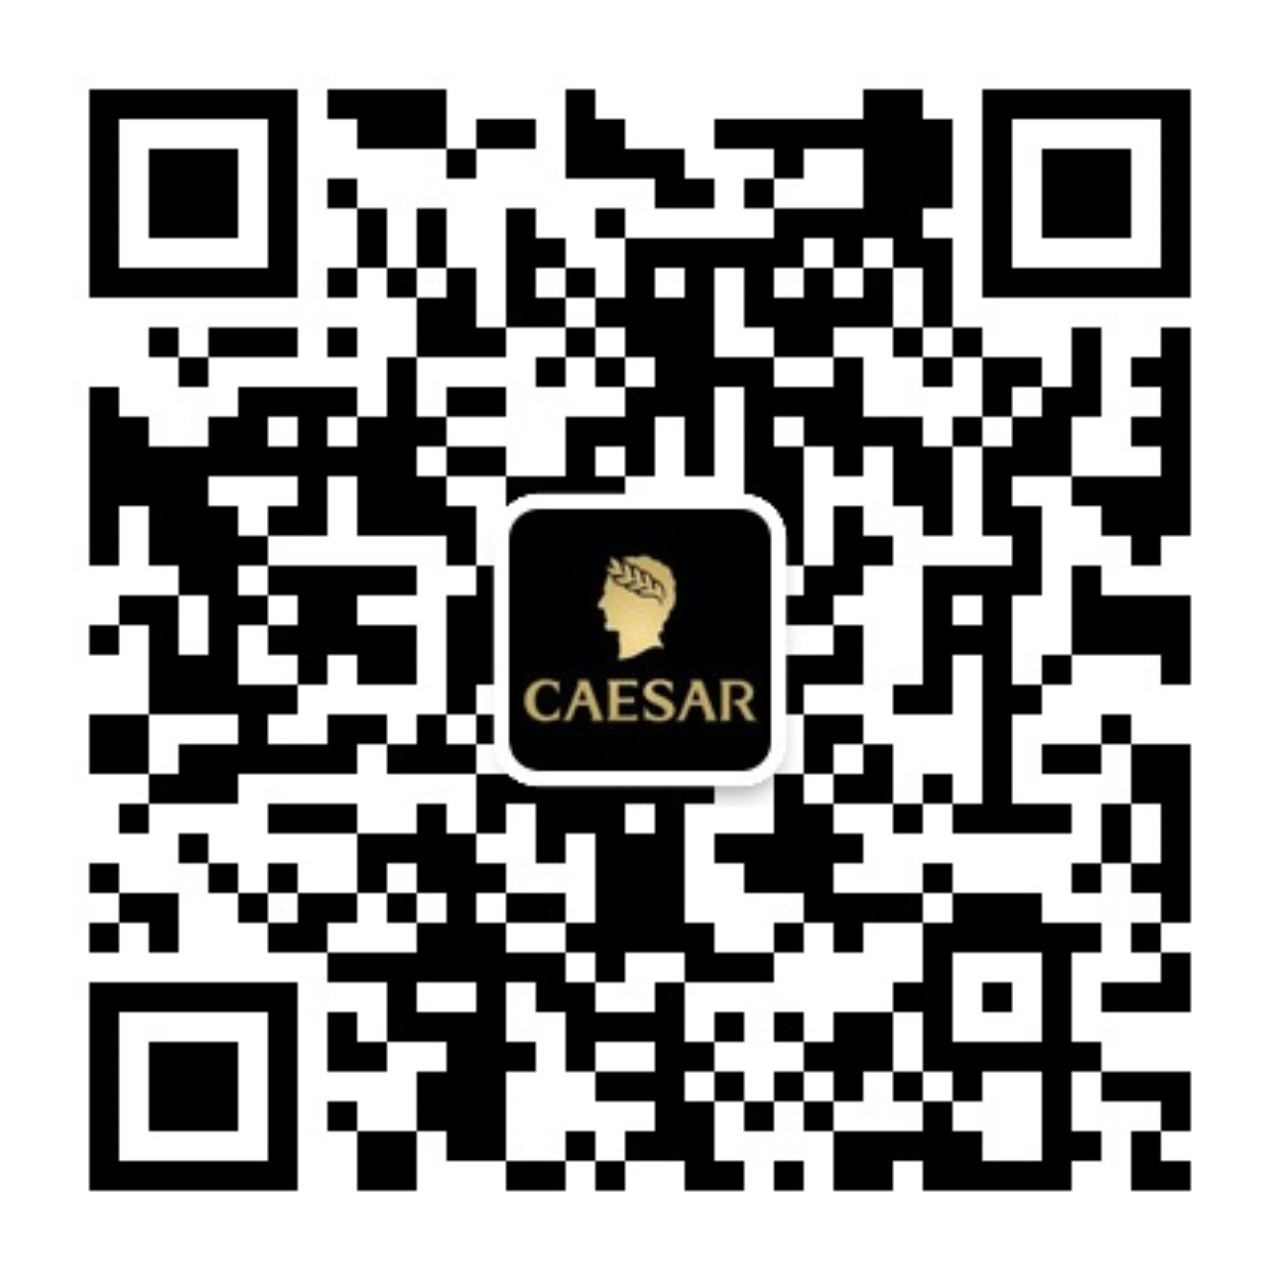 100a3838-9e7d-4772-9619-3b786aea92b2